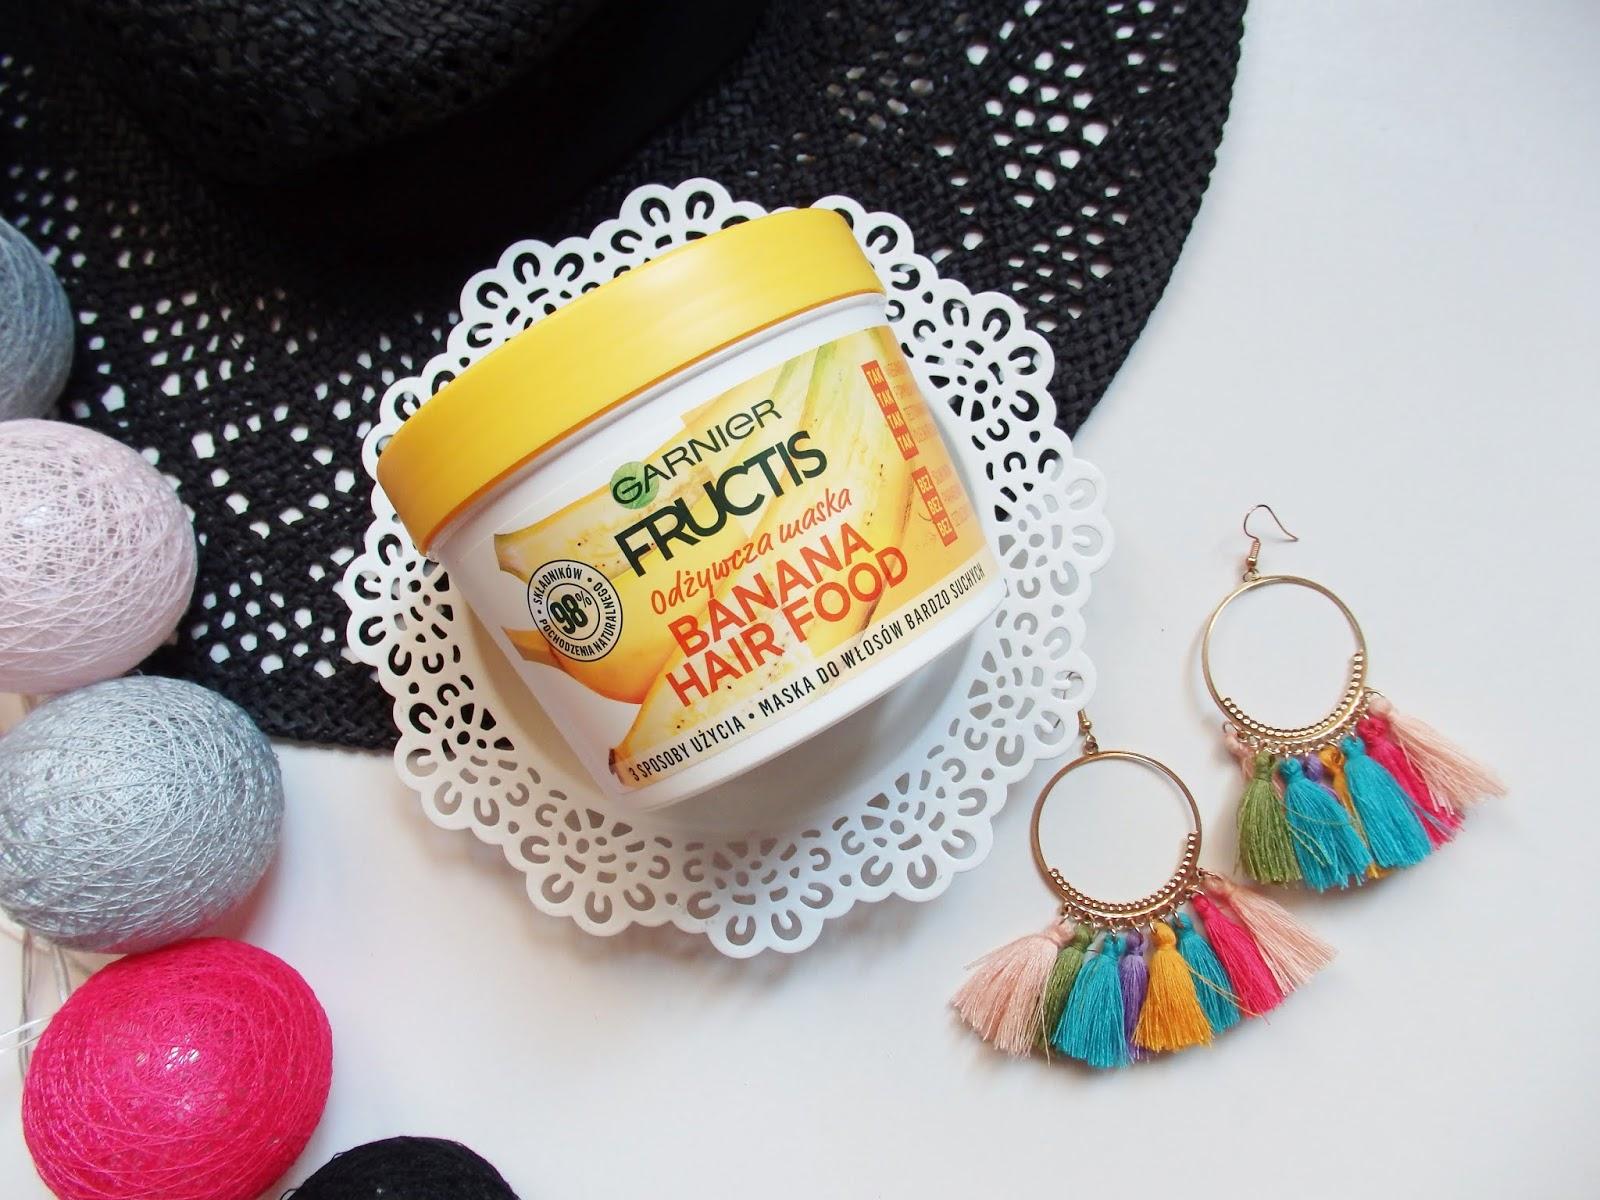 Garnier Fructis, Banana Hair Food - najlepsza maska do włosów suchych?